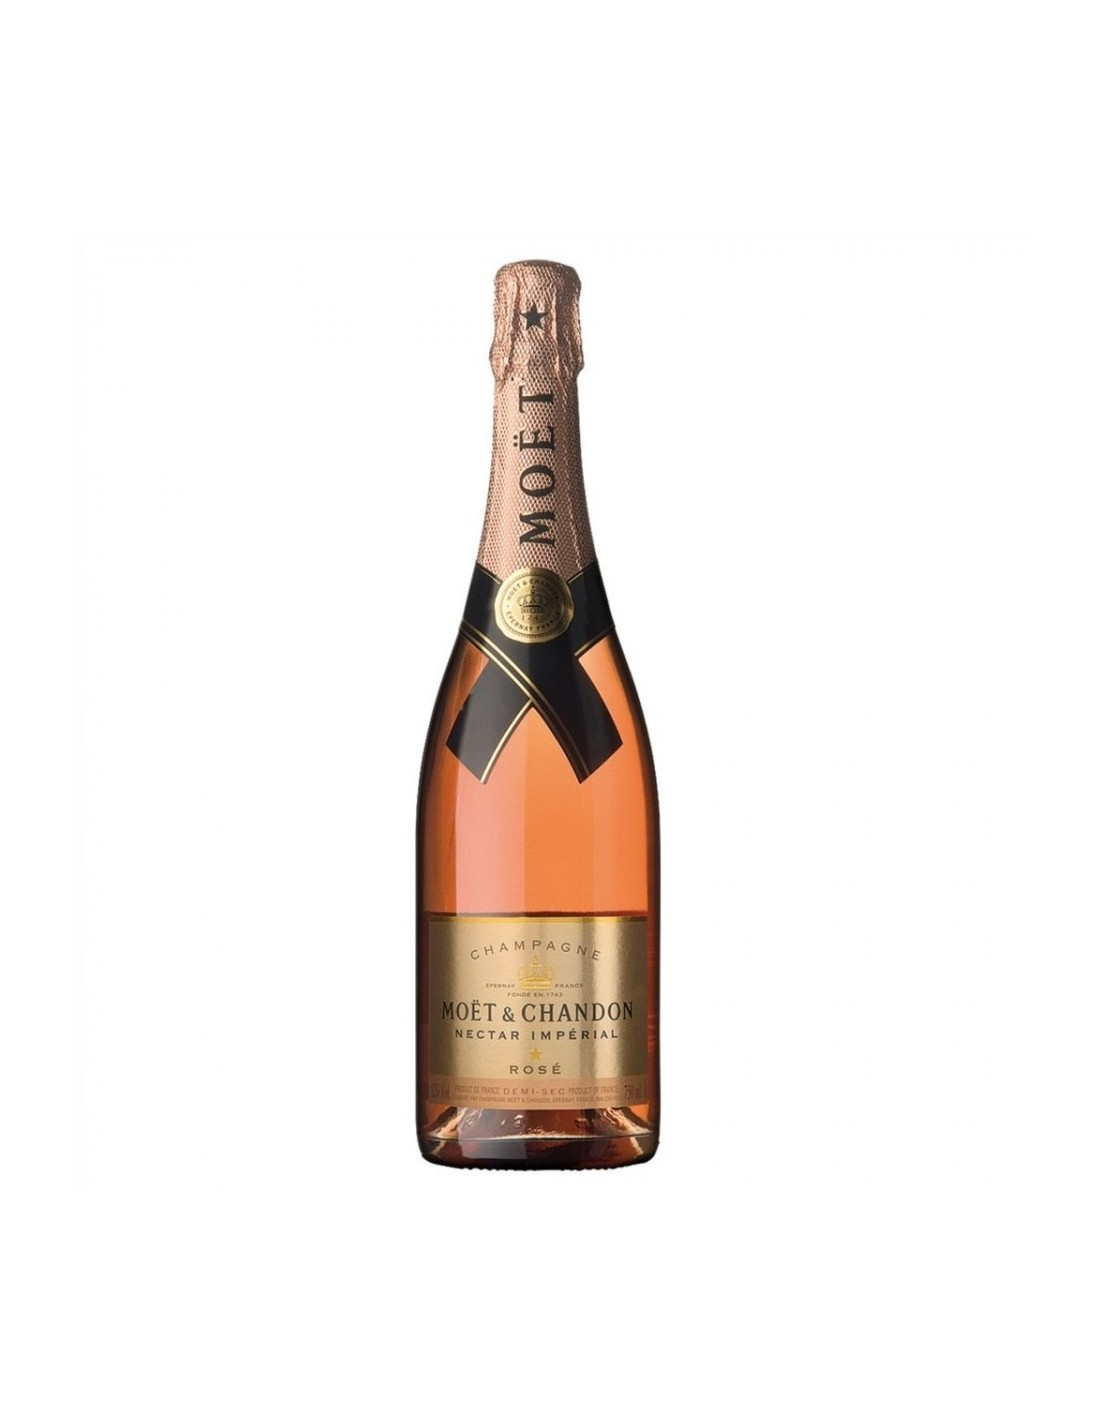 Sampanie Moët & Chandon Nectar Imperial Champagne, 0.75L, 12% alc., Franta